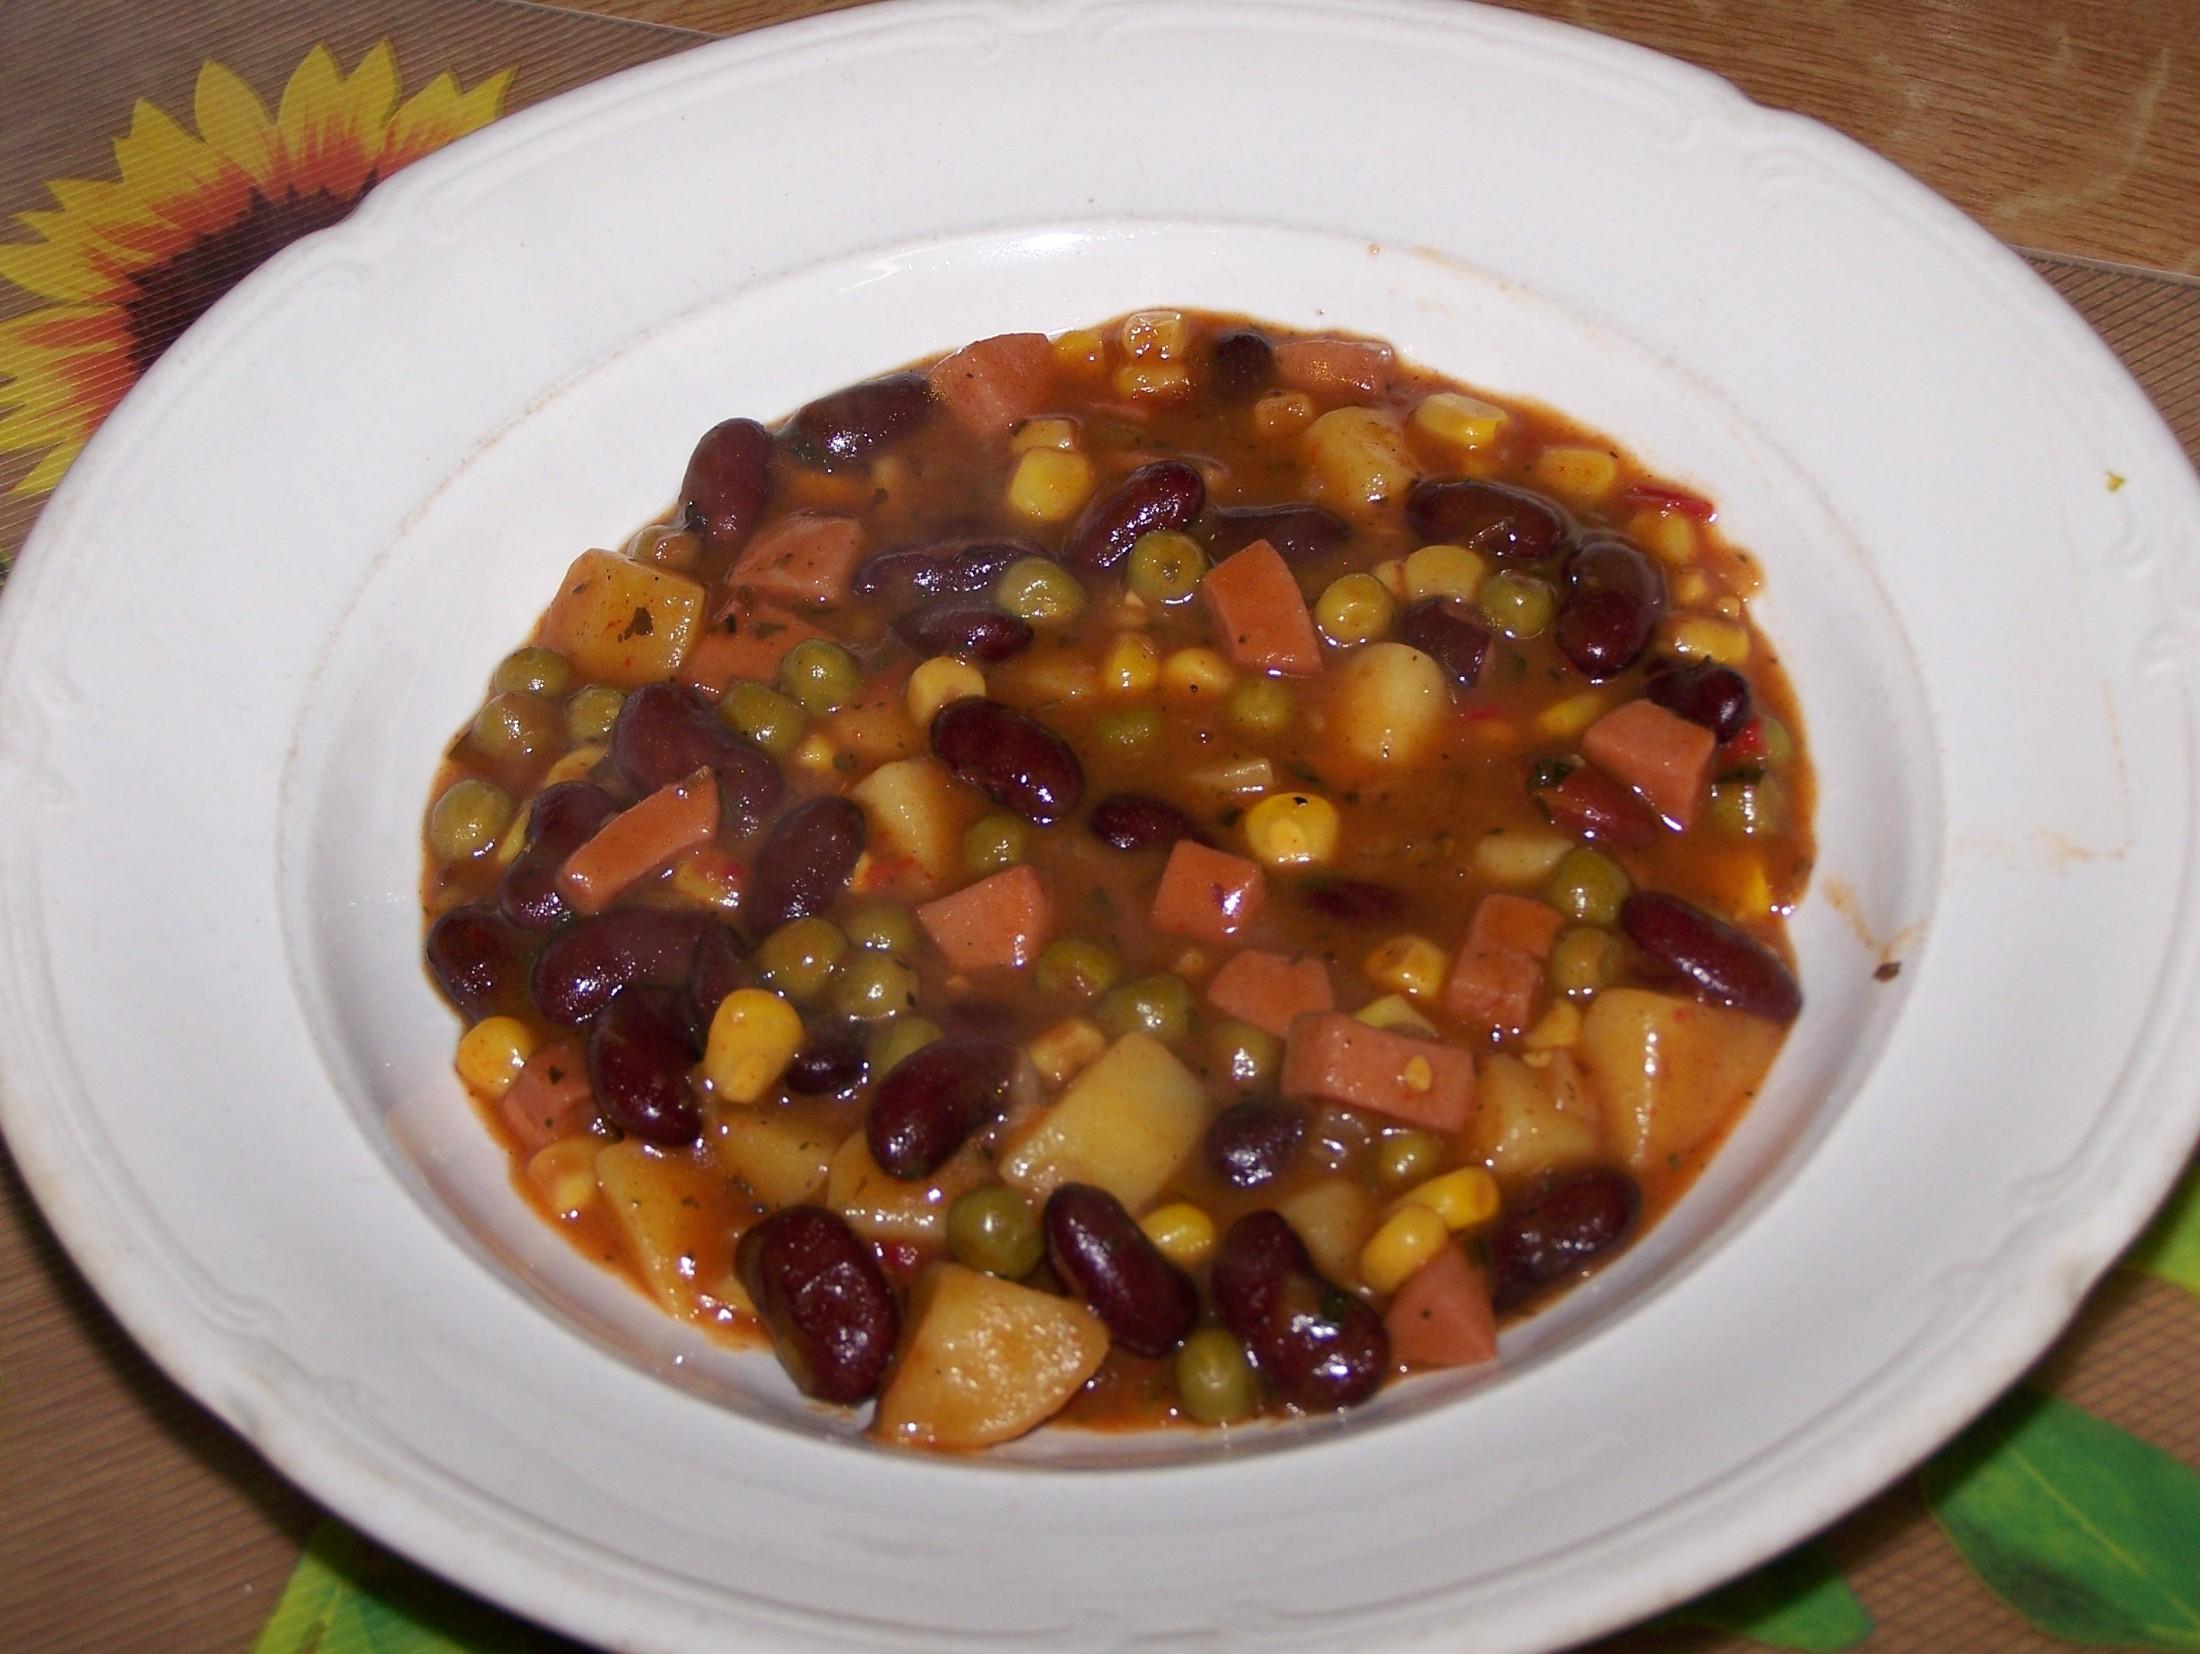 Fazolový guláš s bramborami, uzeninou a zeleninou